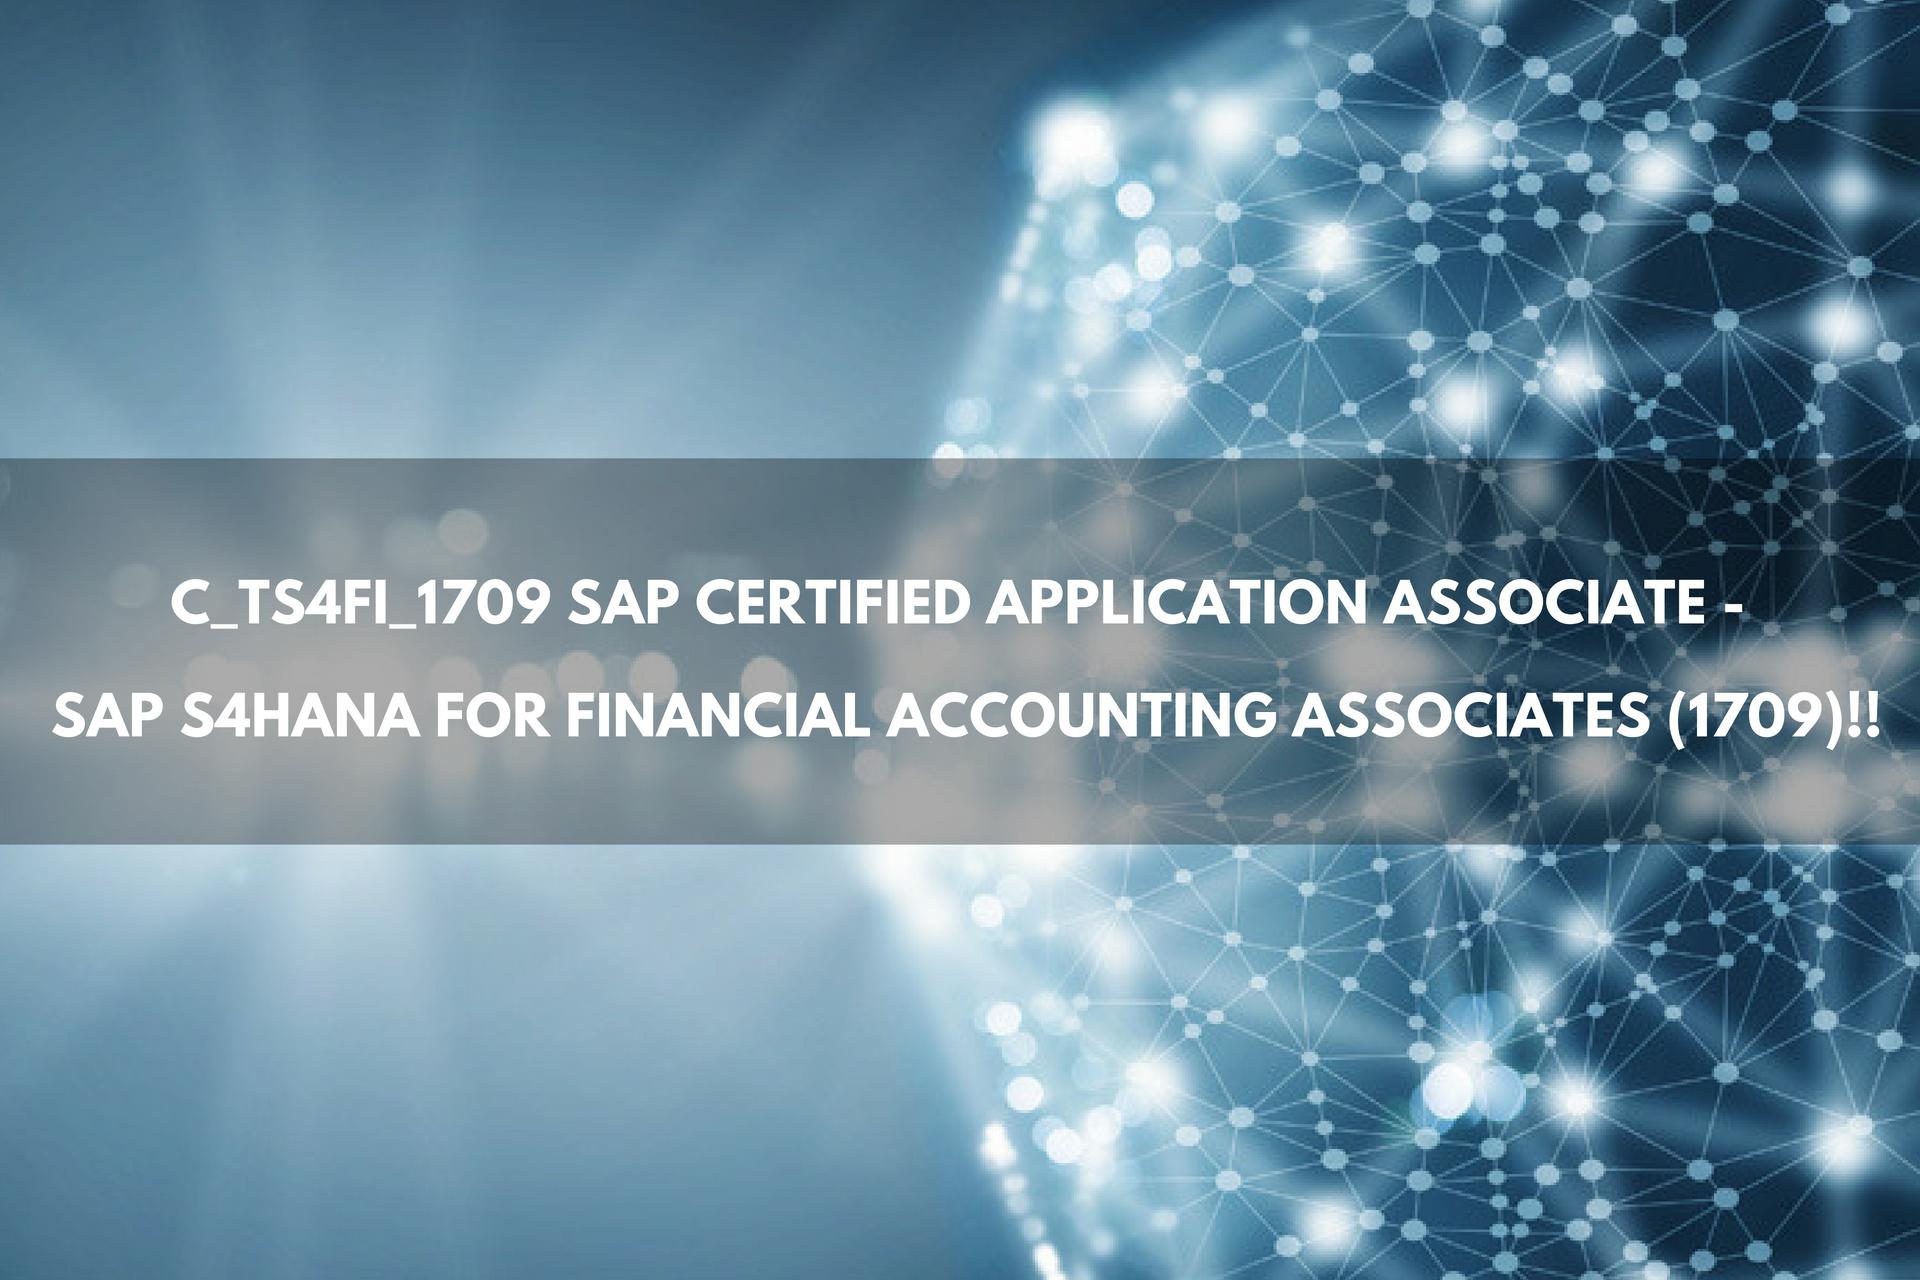 C_TS4FI_1709 SAP Certified Application Associate - SAP S4HANA for